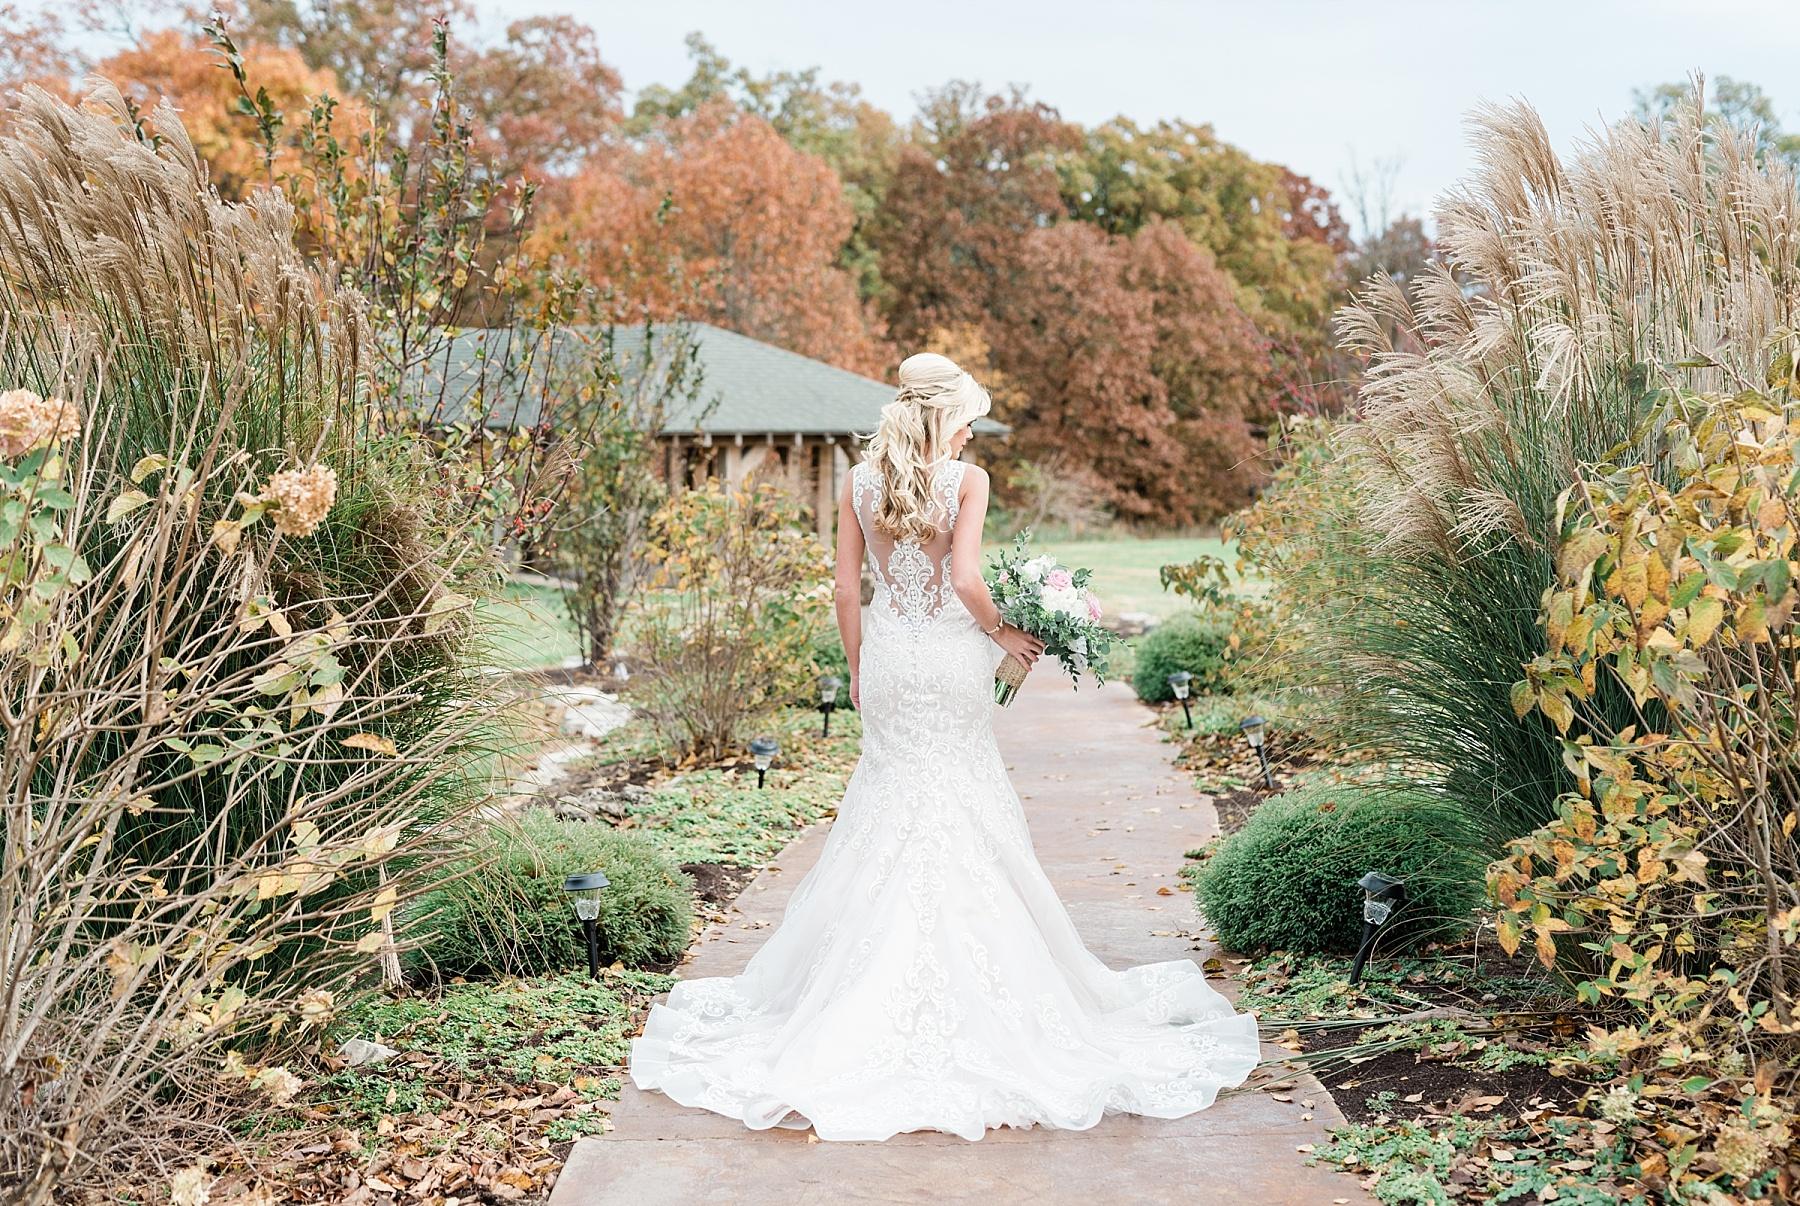 Lakeside Wedding in Fall at Mighty Oak Lodge by Misouri Wedding Photographer Kelsi Kliethermes Photography_0010.jpg